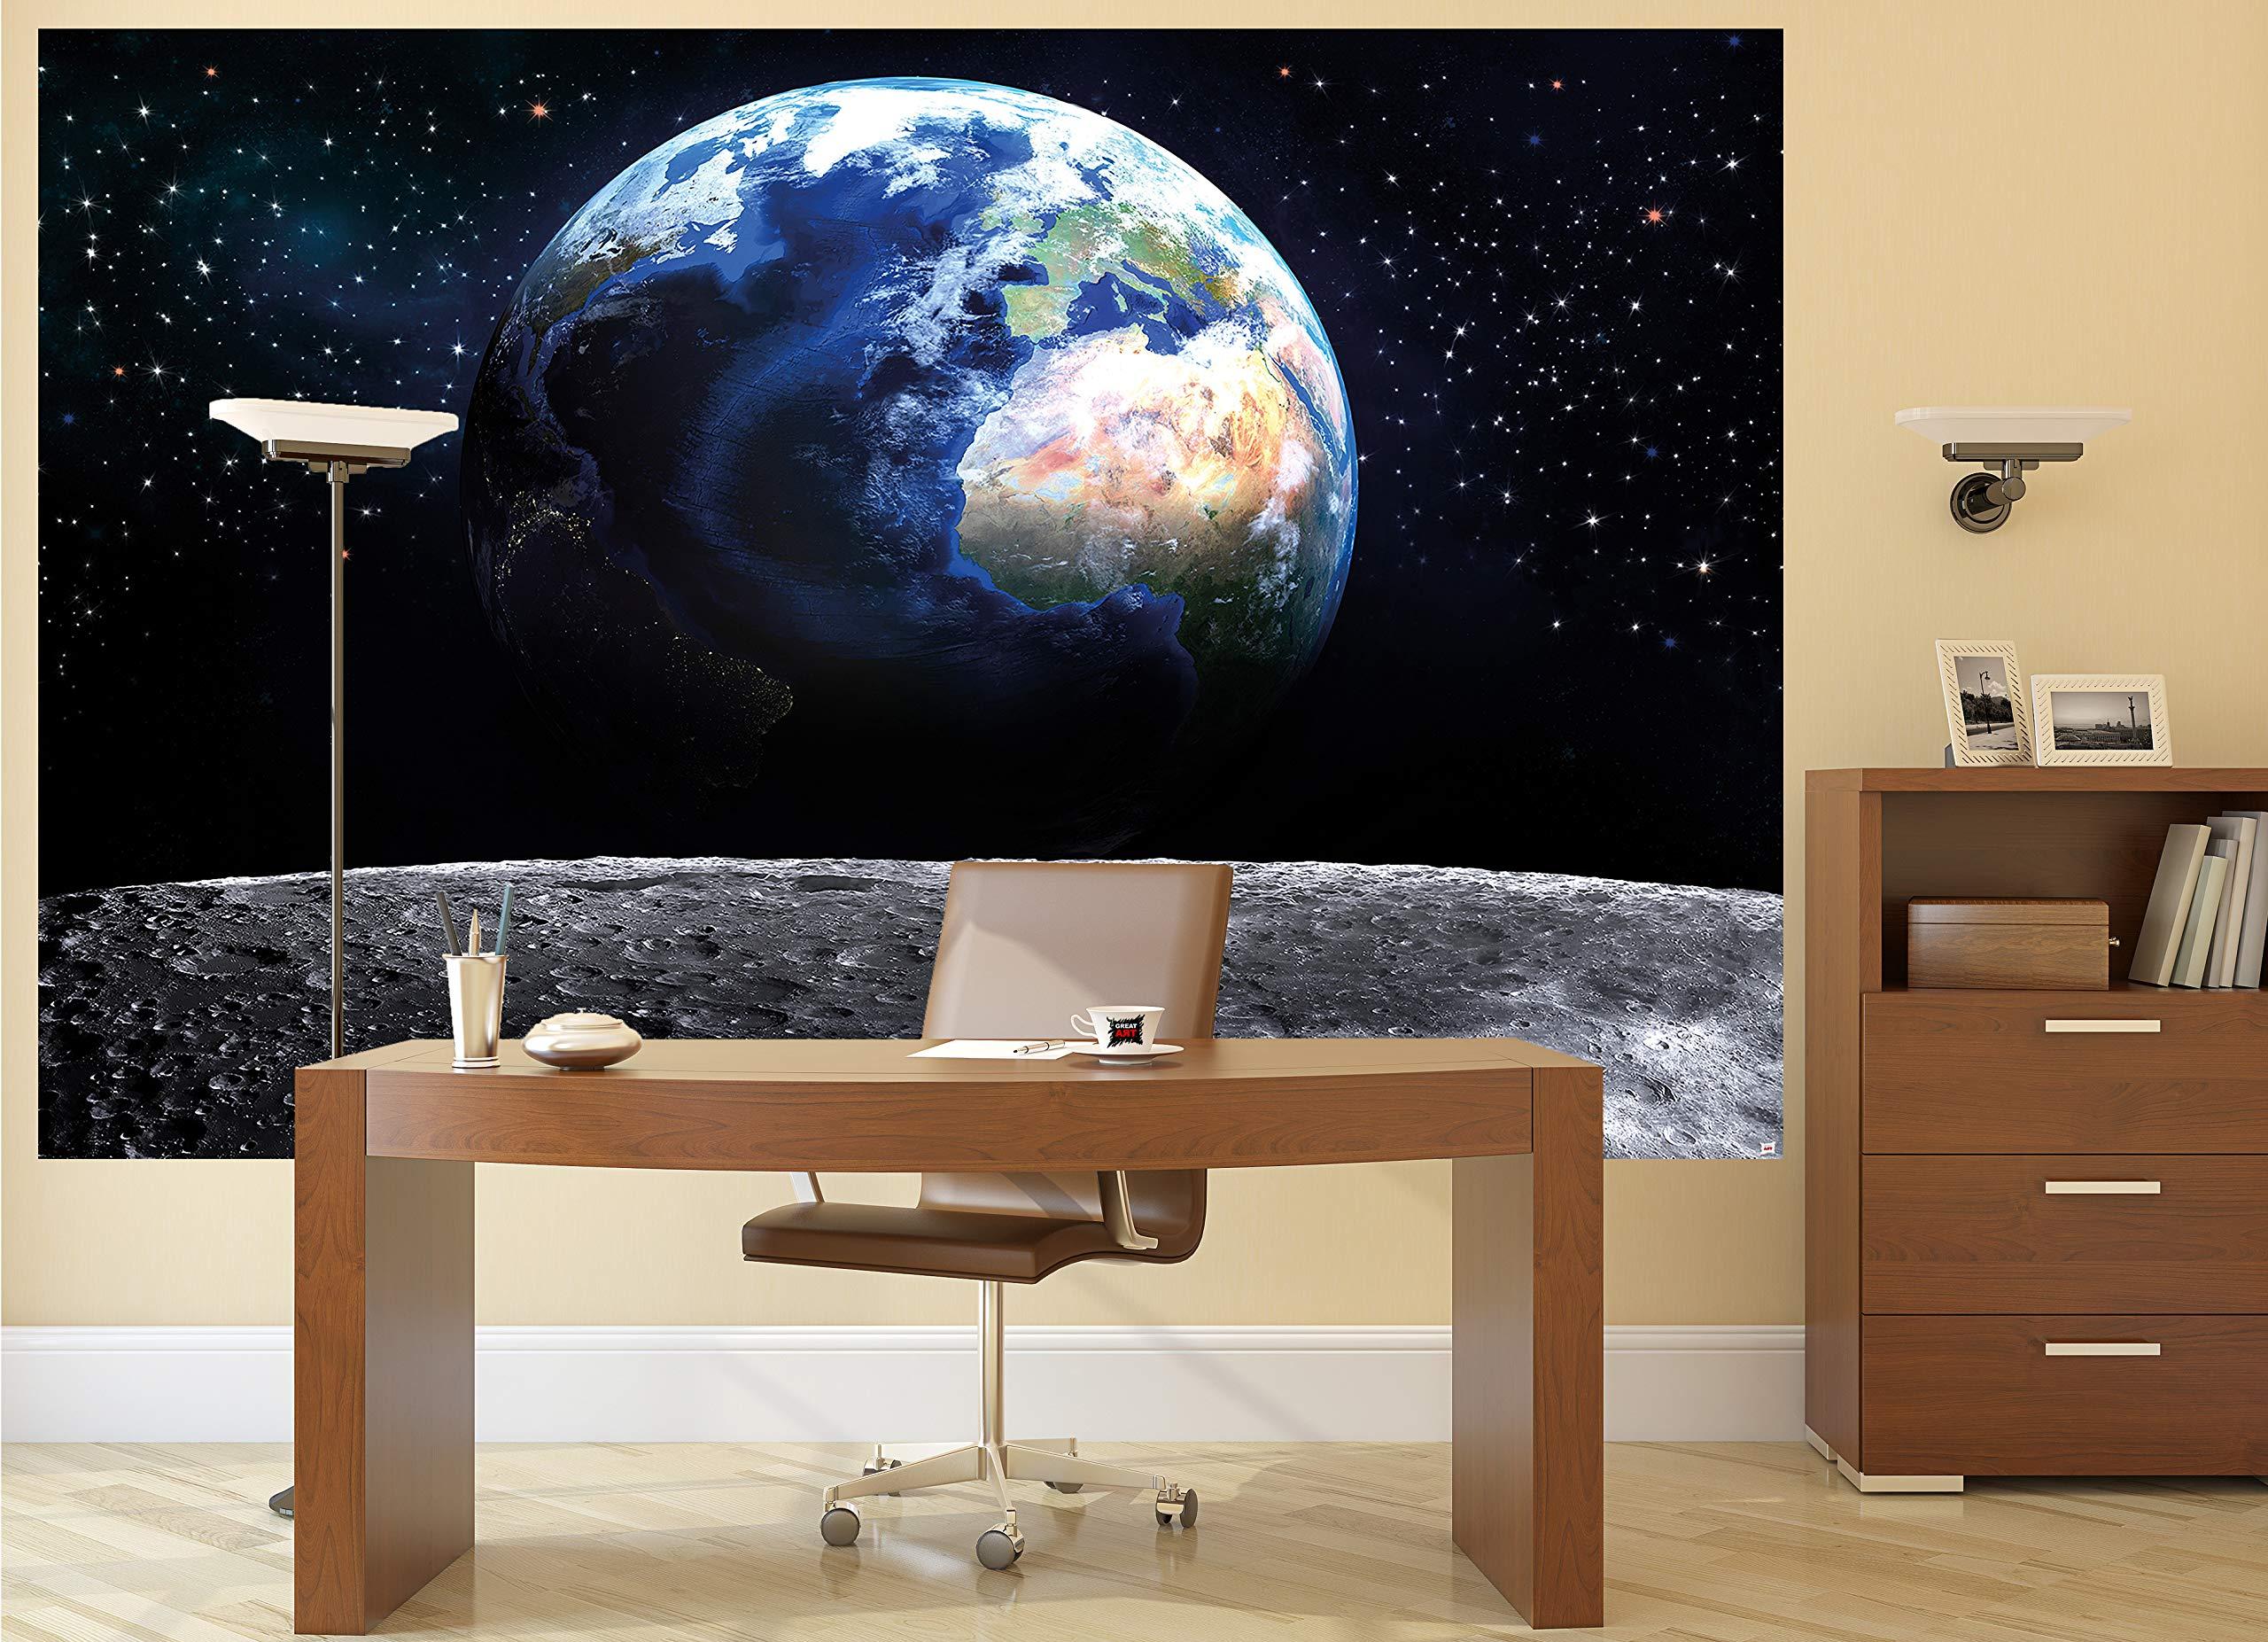 Premium Plus Photo Non-woven Photographic Wallpaper 200 x 140 cm Top Quality